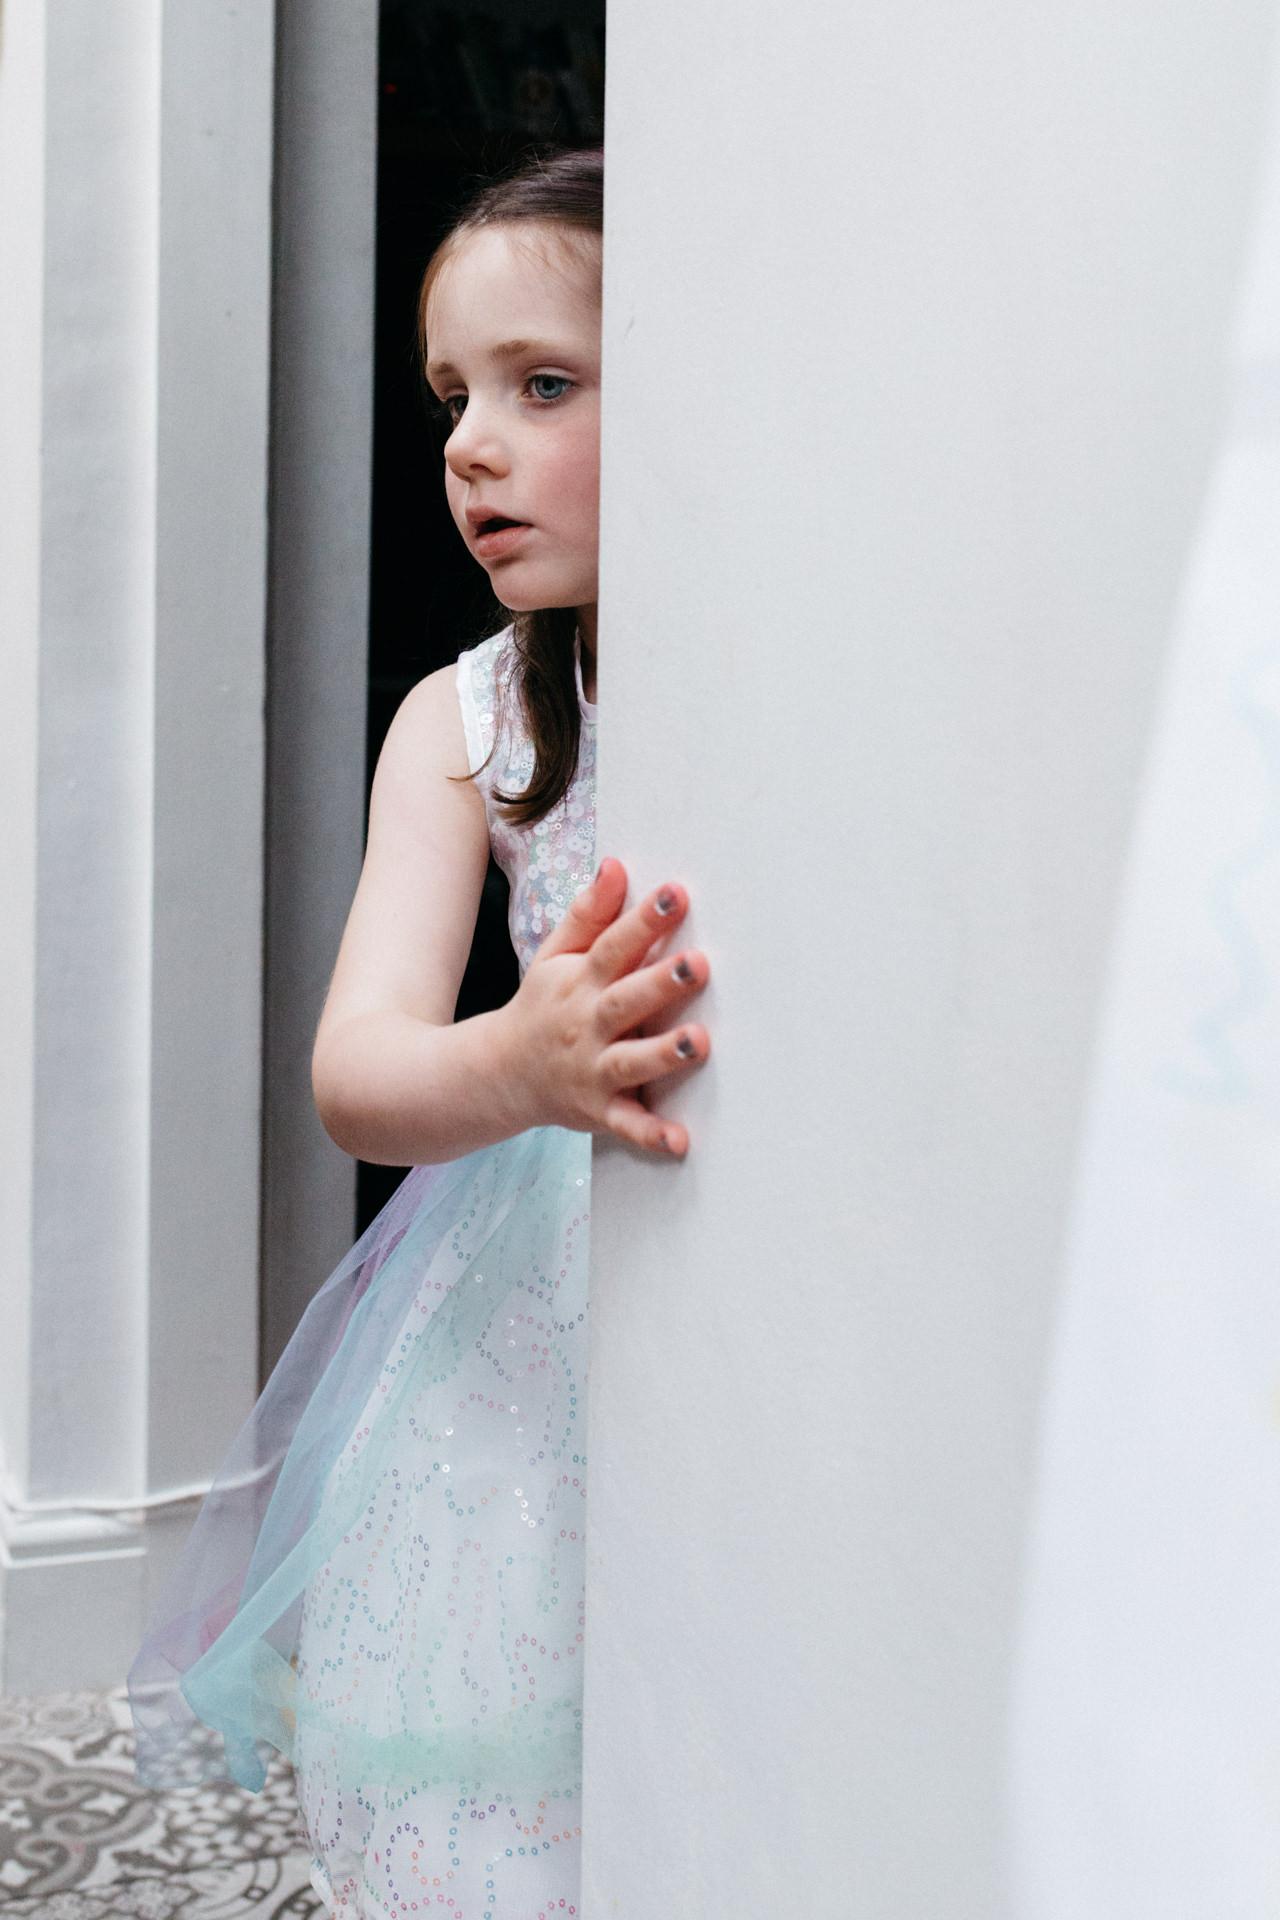 Children photography in London